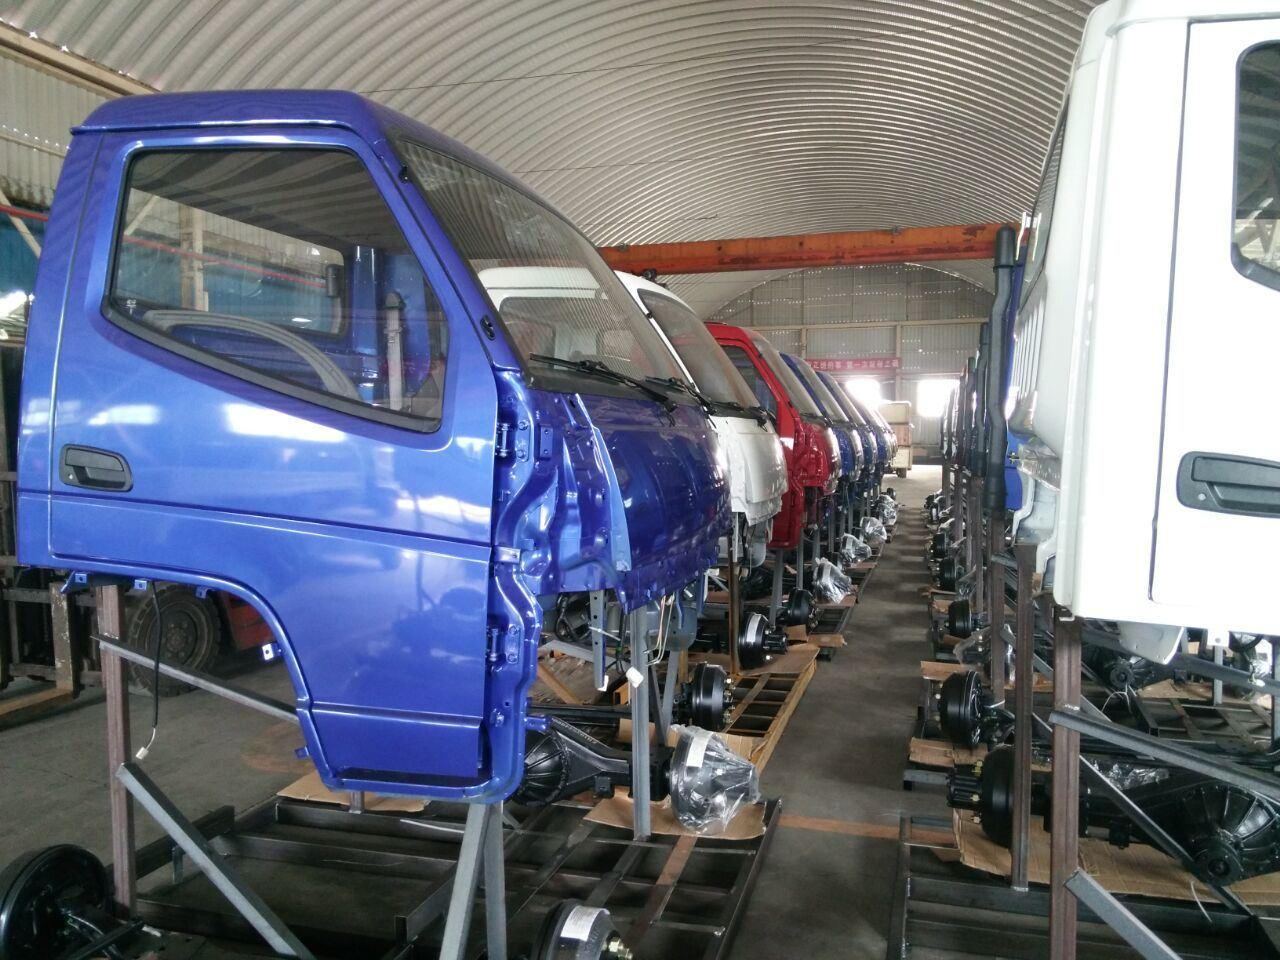 T. King Rhd Light Truck with Isuzu Engine